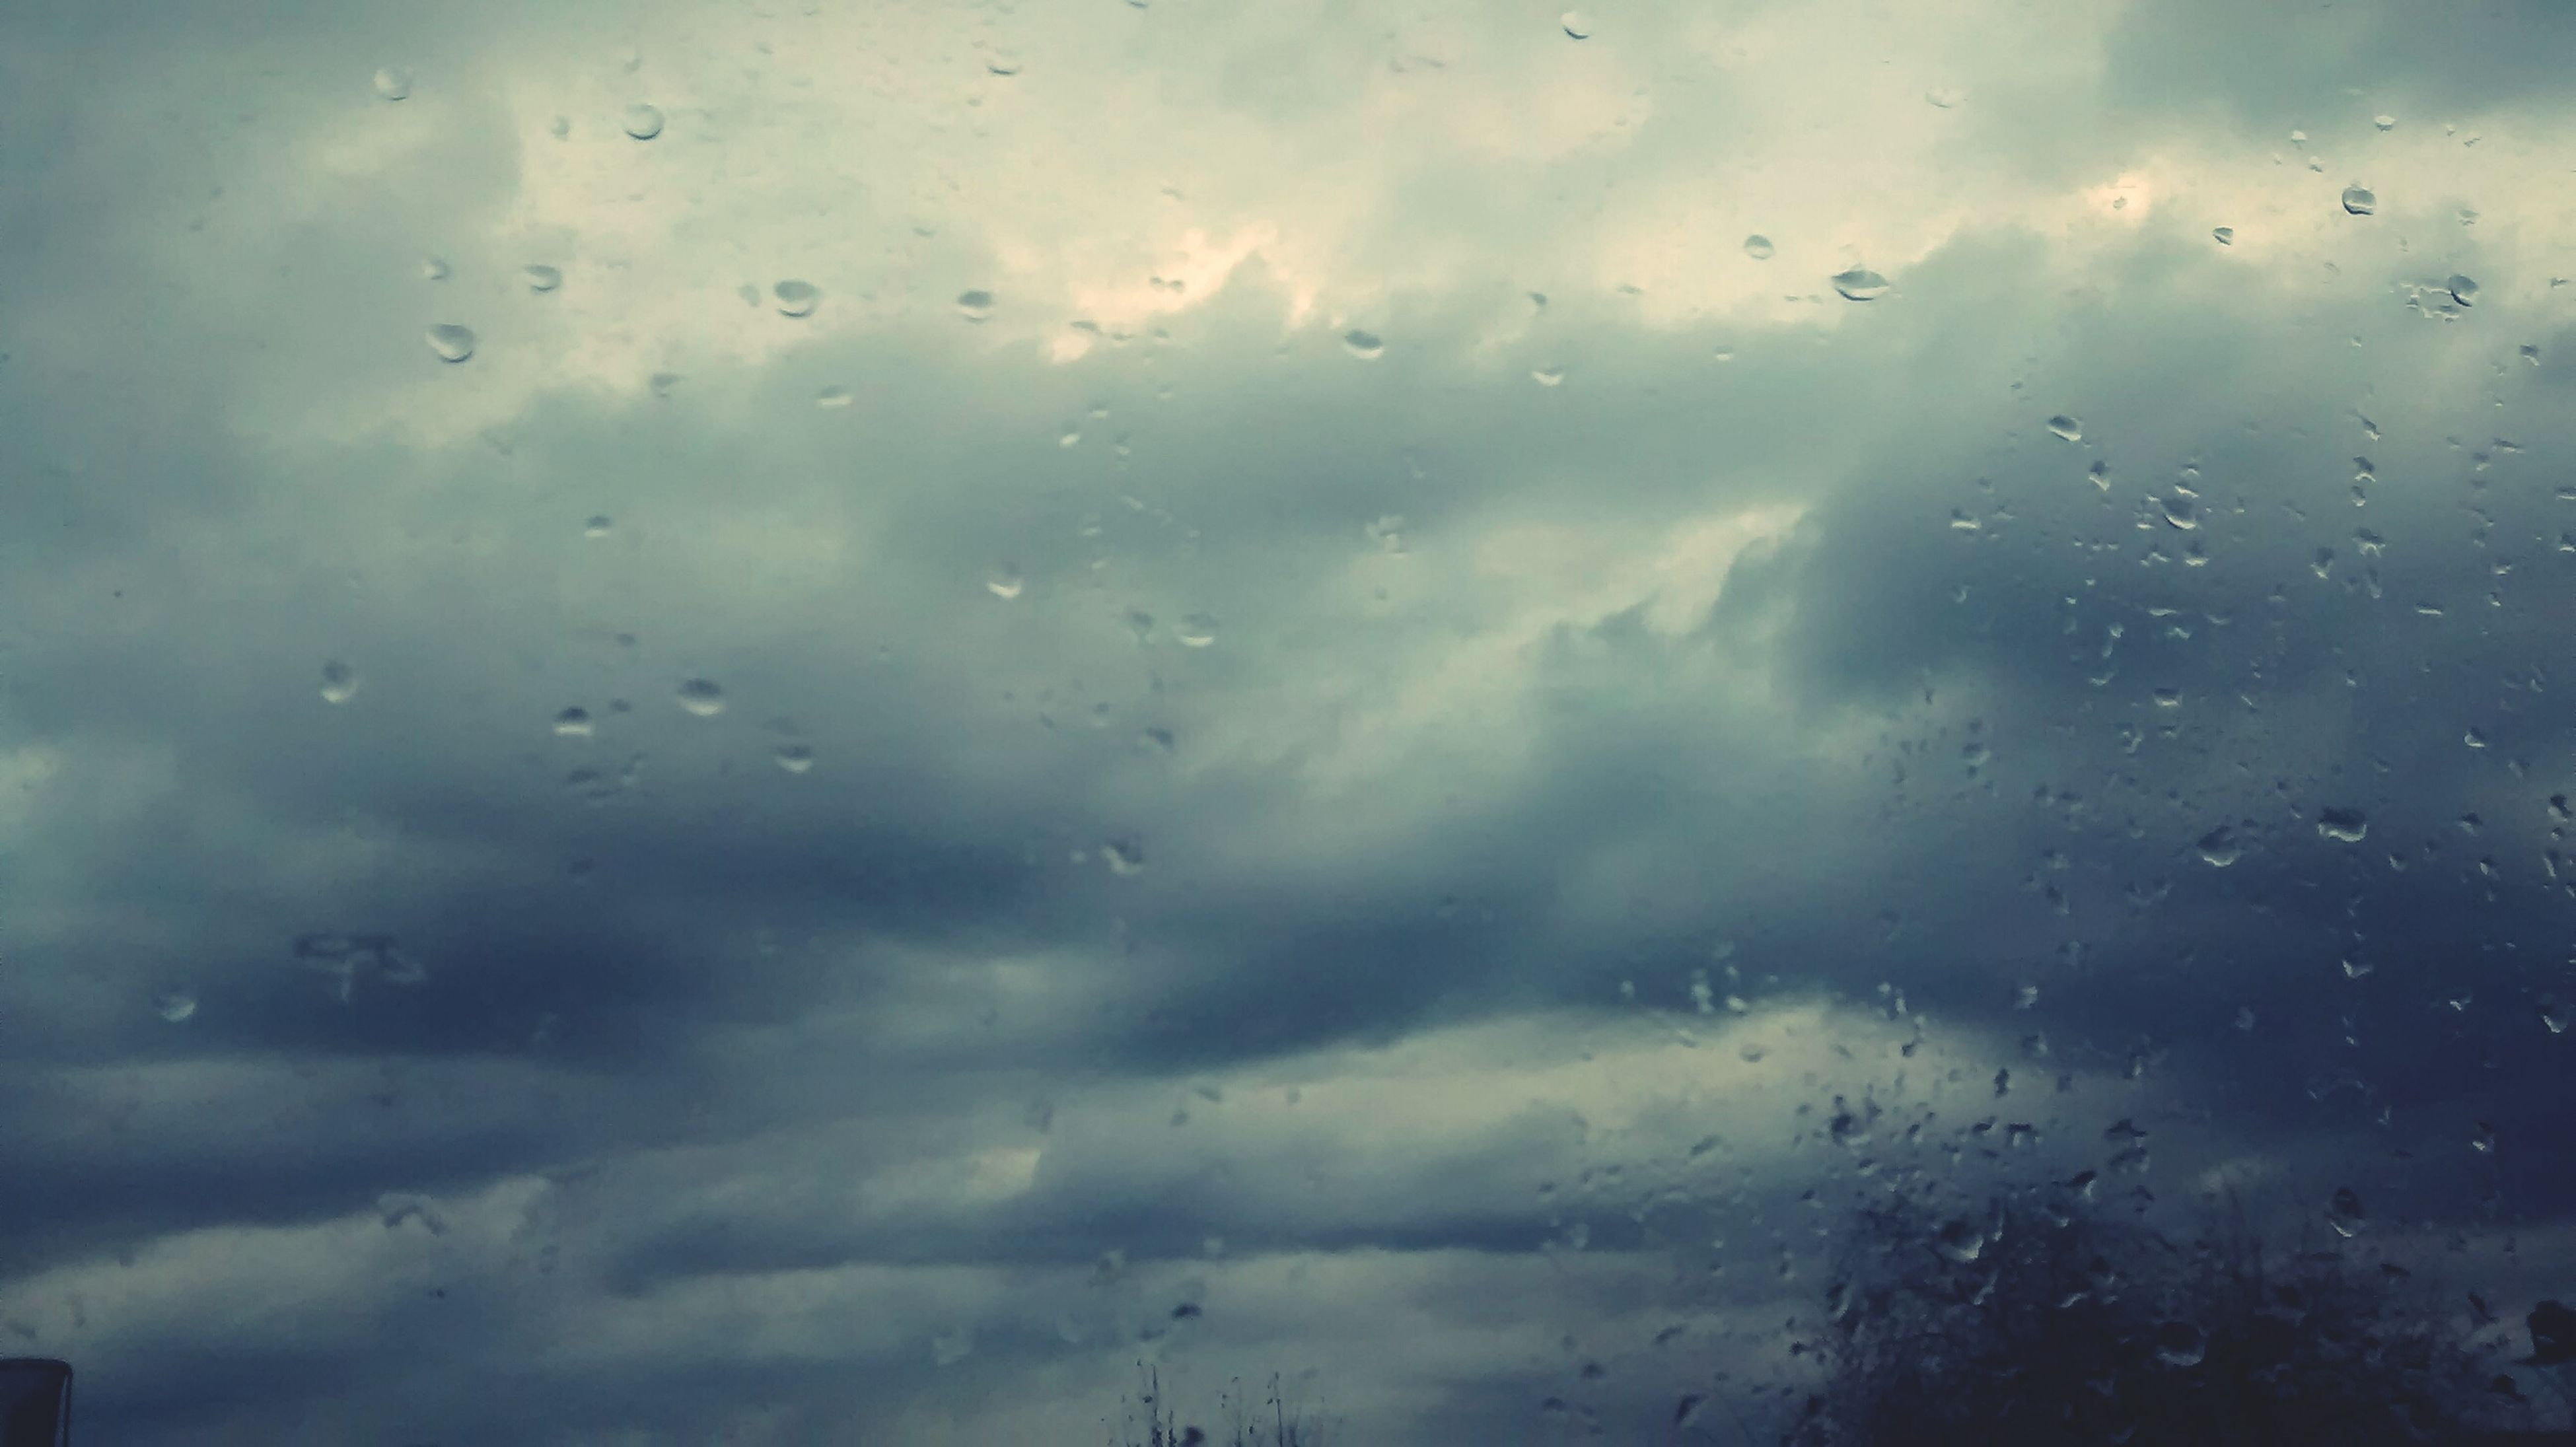 drop, sky, wet, window, weather, water, rain, transparent, cloud - sky, glass - material, indoors, raindrop, cloudy, backgrounds, full frame, cloud, glass, overcast, nature, dusk